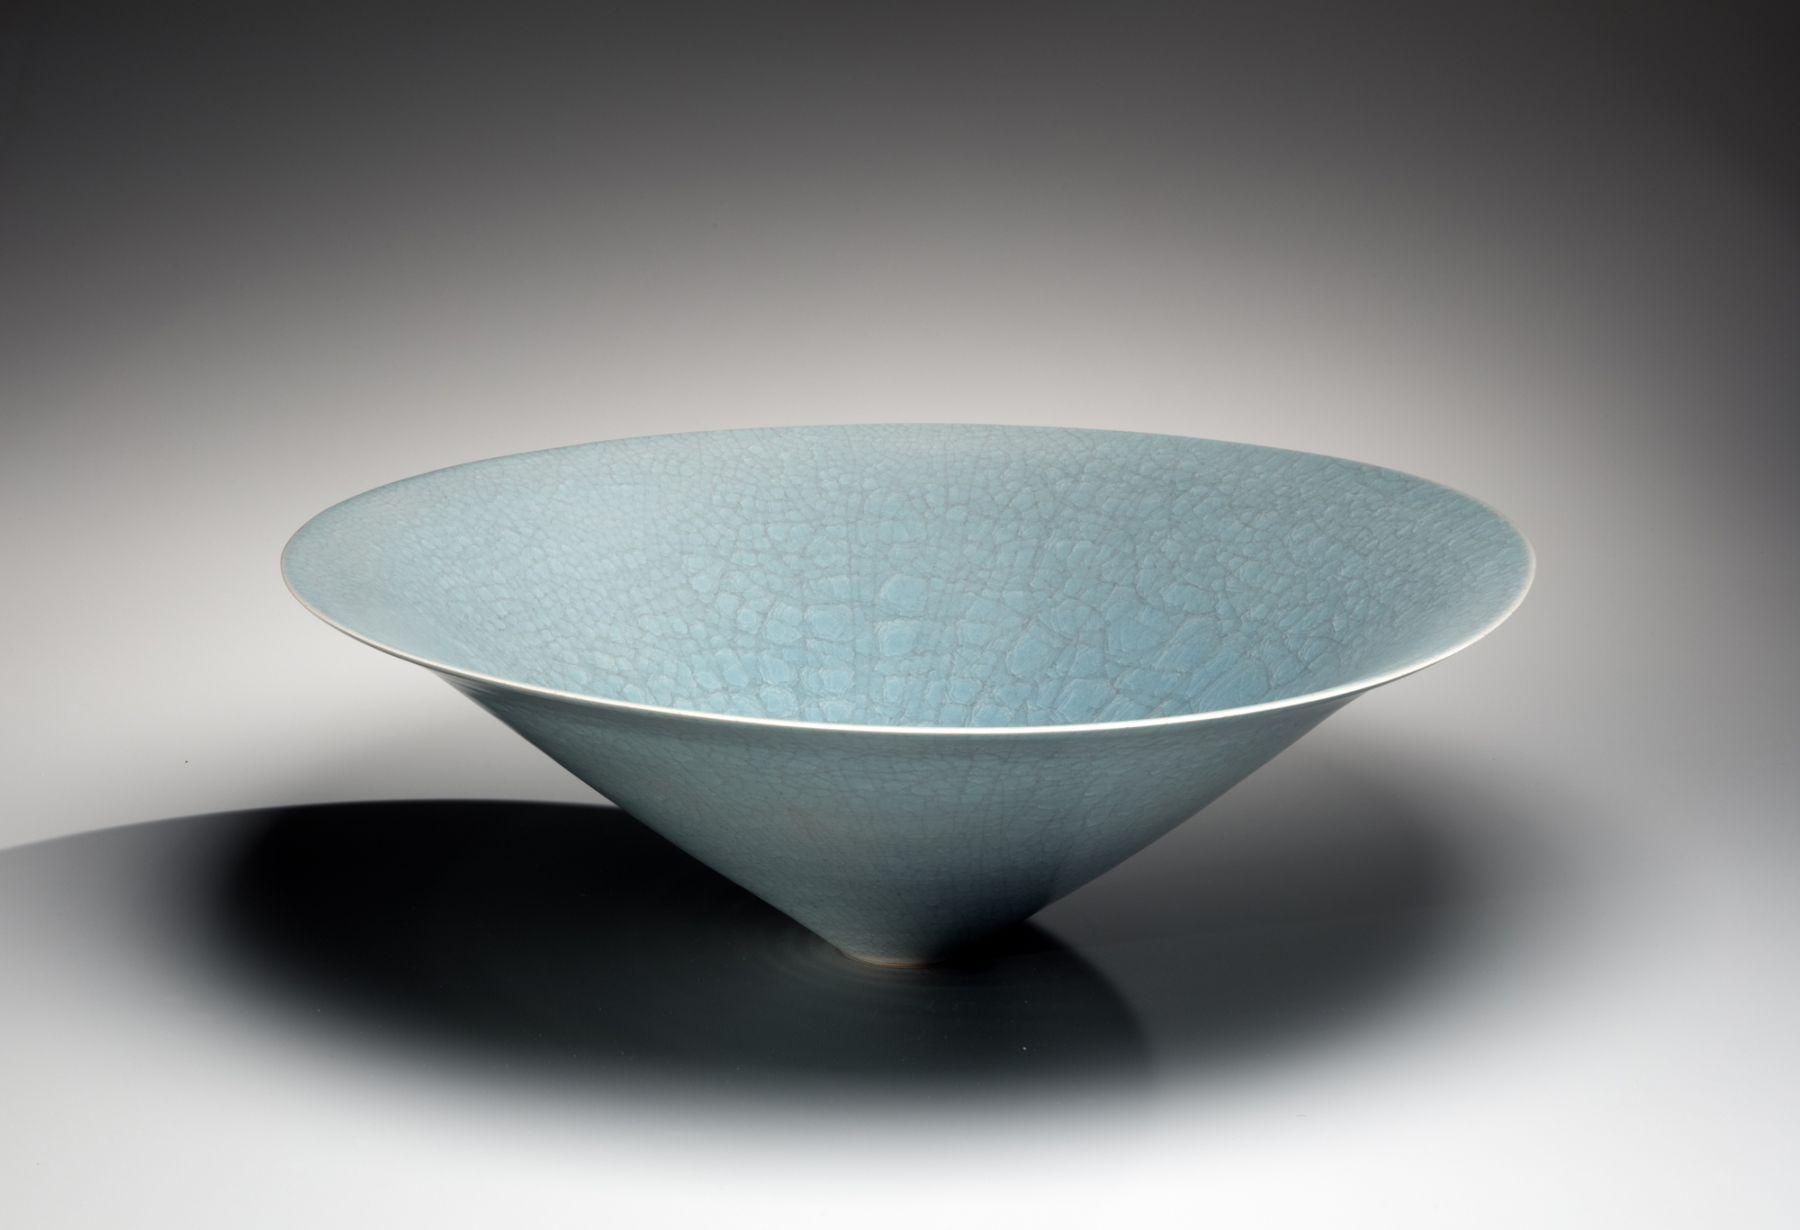 Itō Hidehito (b. 1971), Conical bowl with craquelure celadon glazing